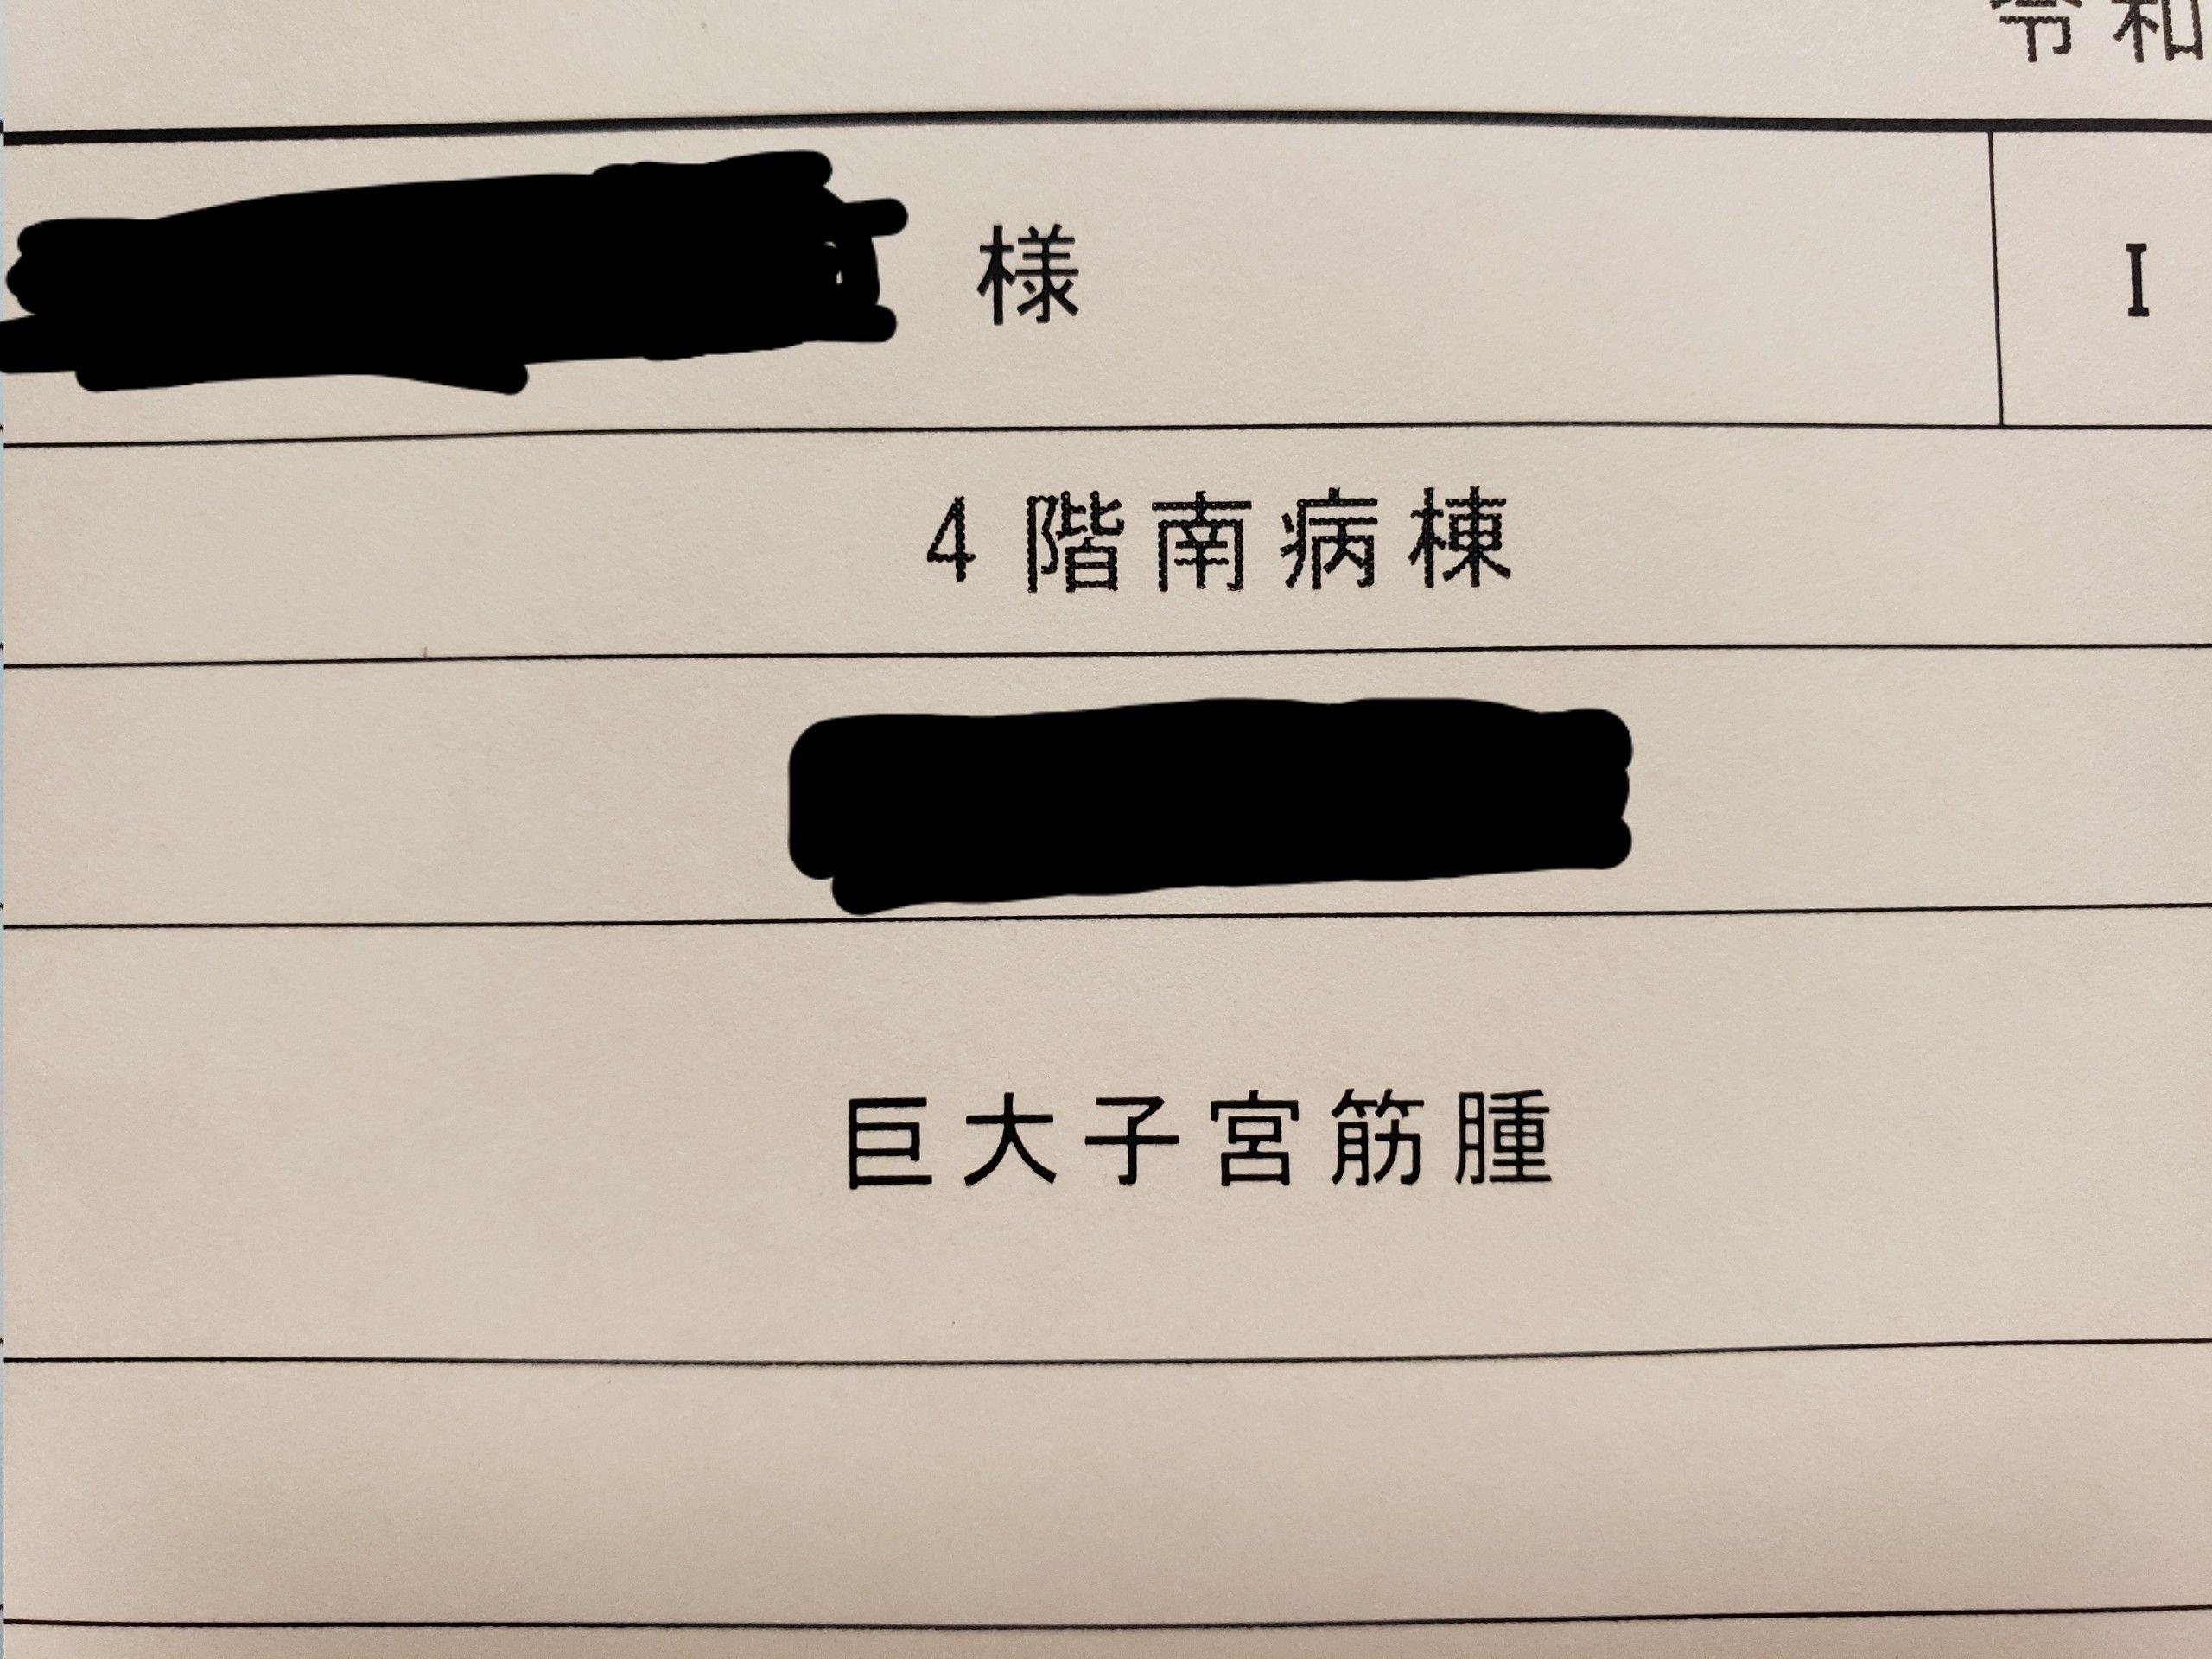 鏡 腹腔 子宮 ブログ 筋腫 手術